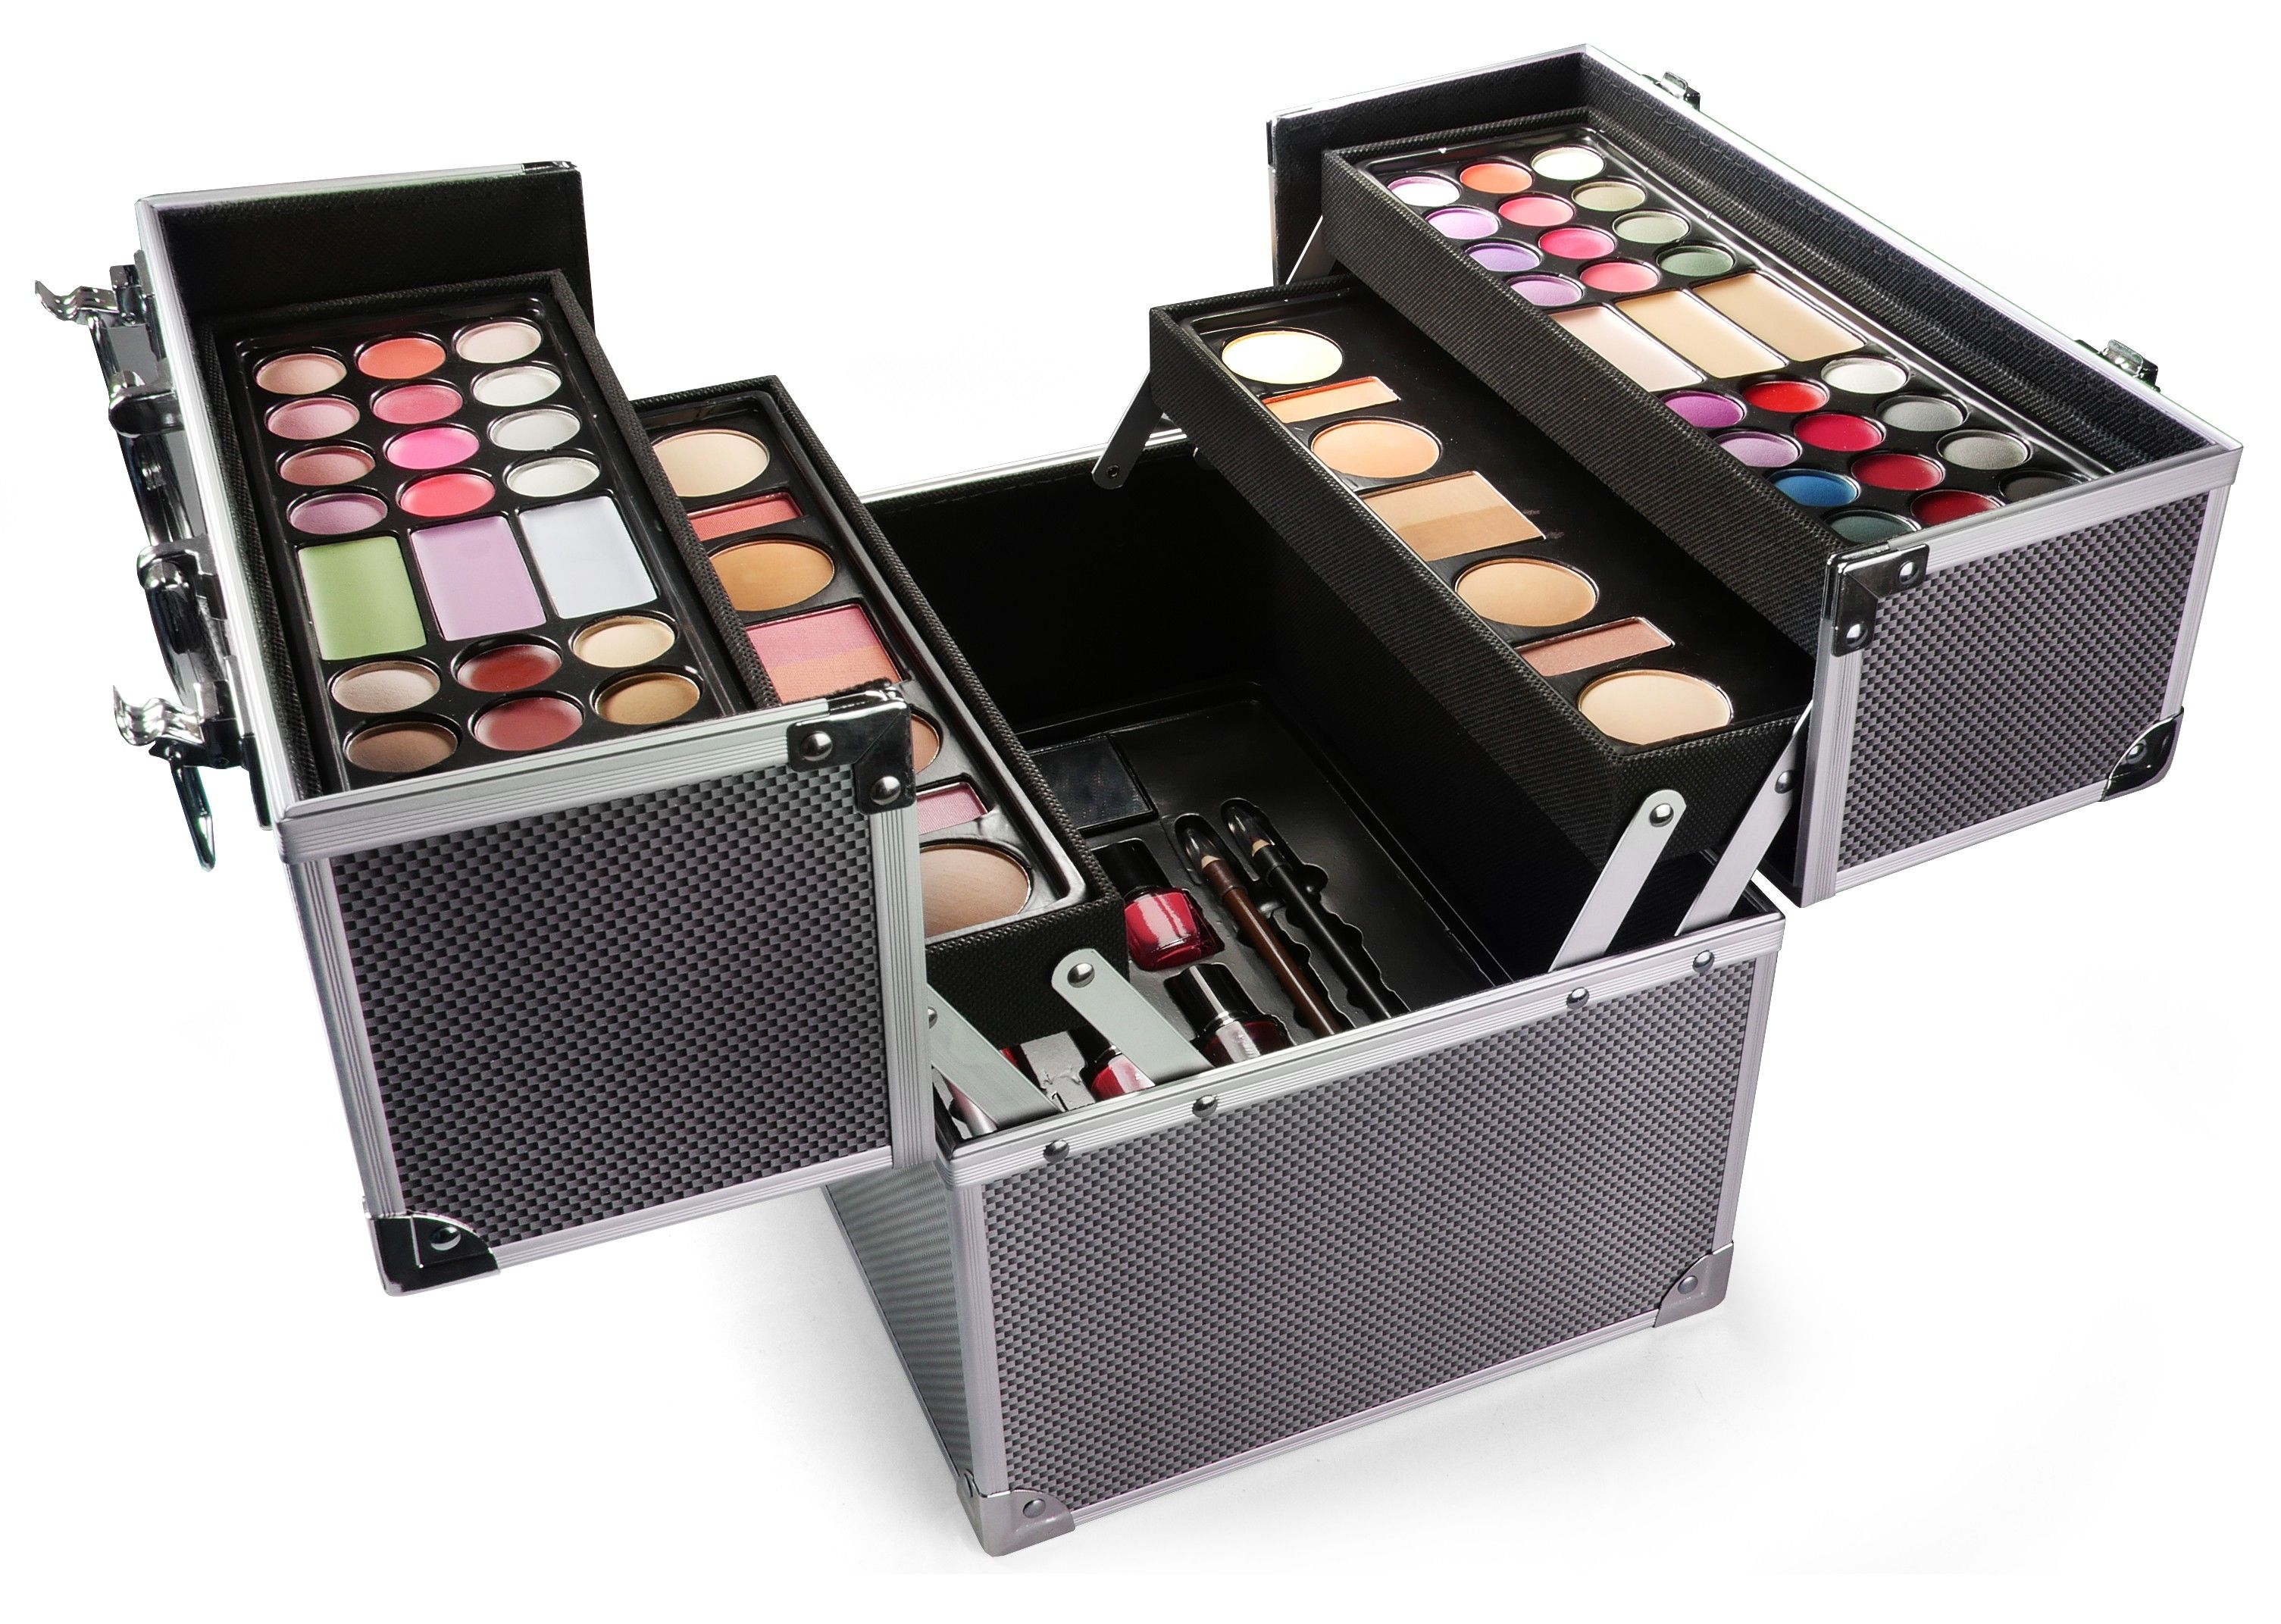 Compra online tu maquillaje y cosmética - Muchomaquillaje.com